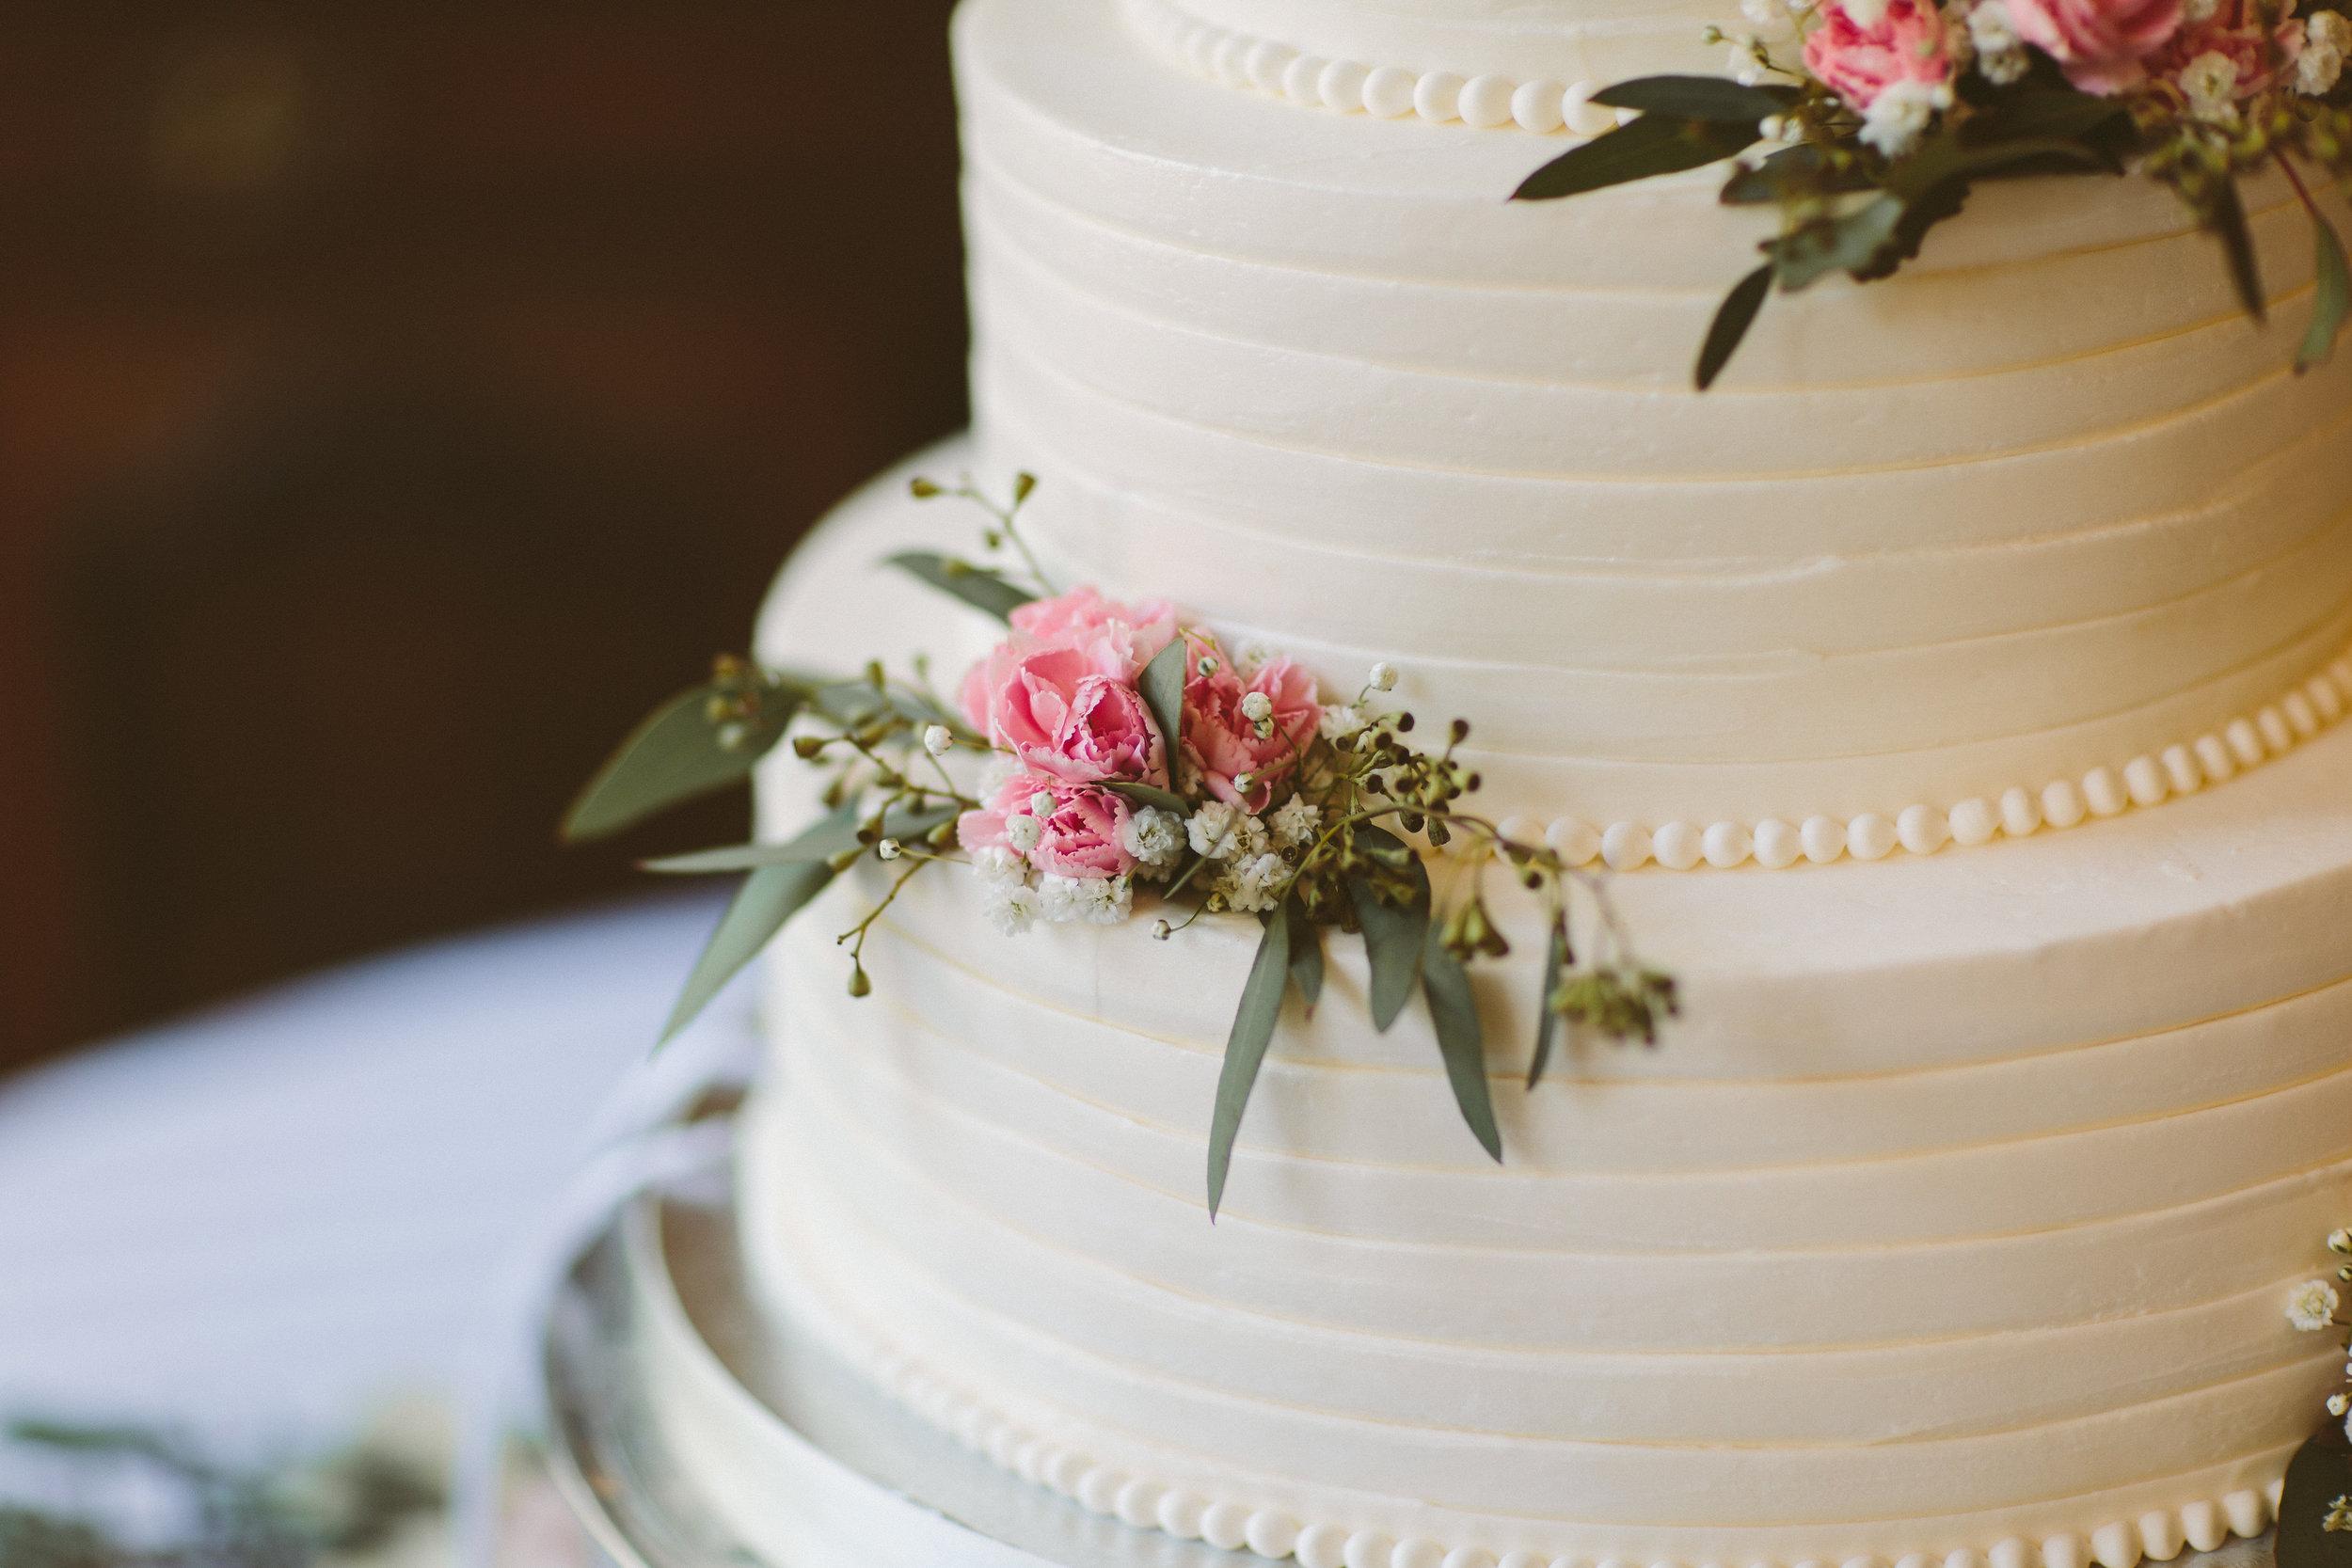 0585_short_wedding - Copy.jpg